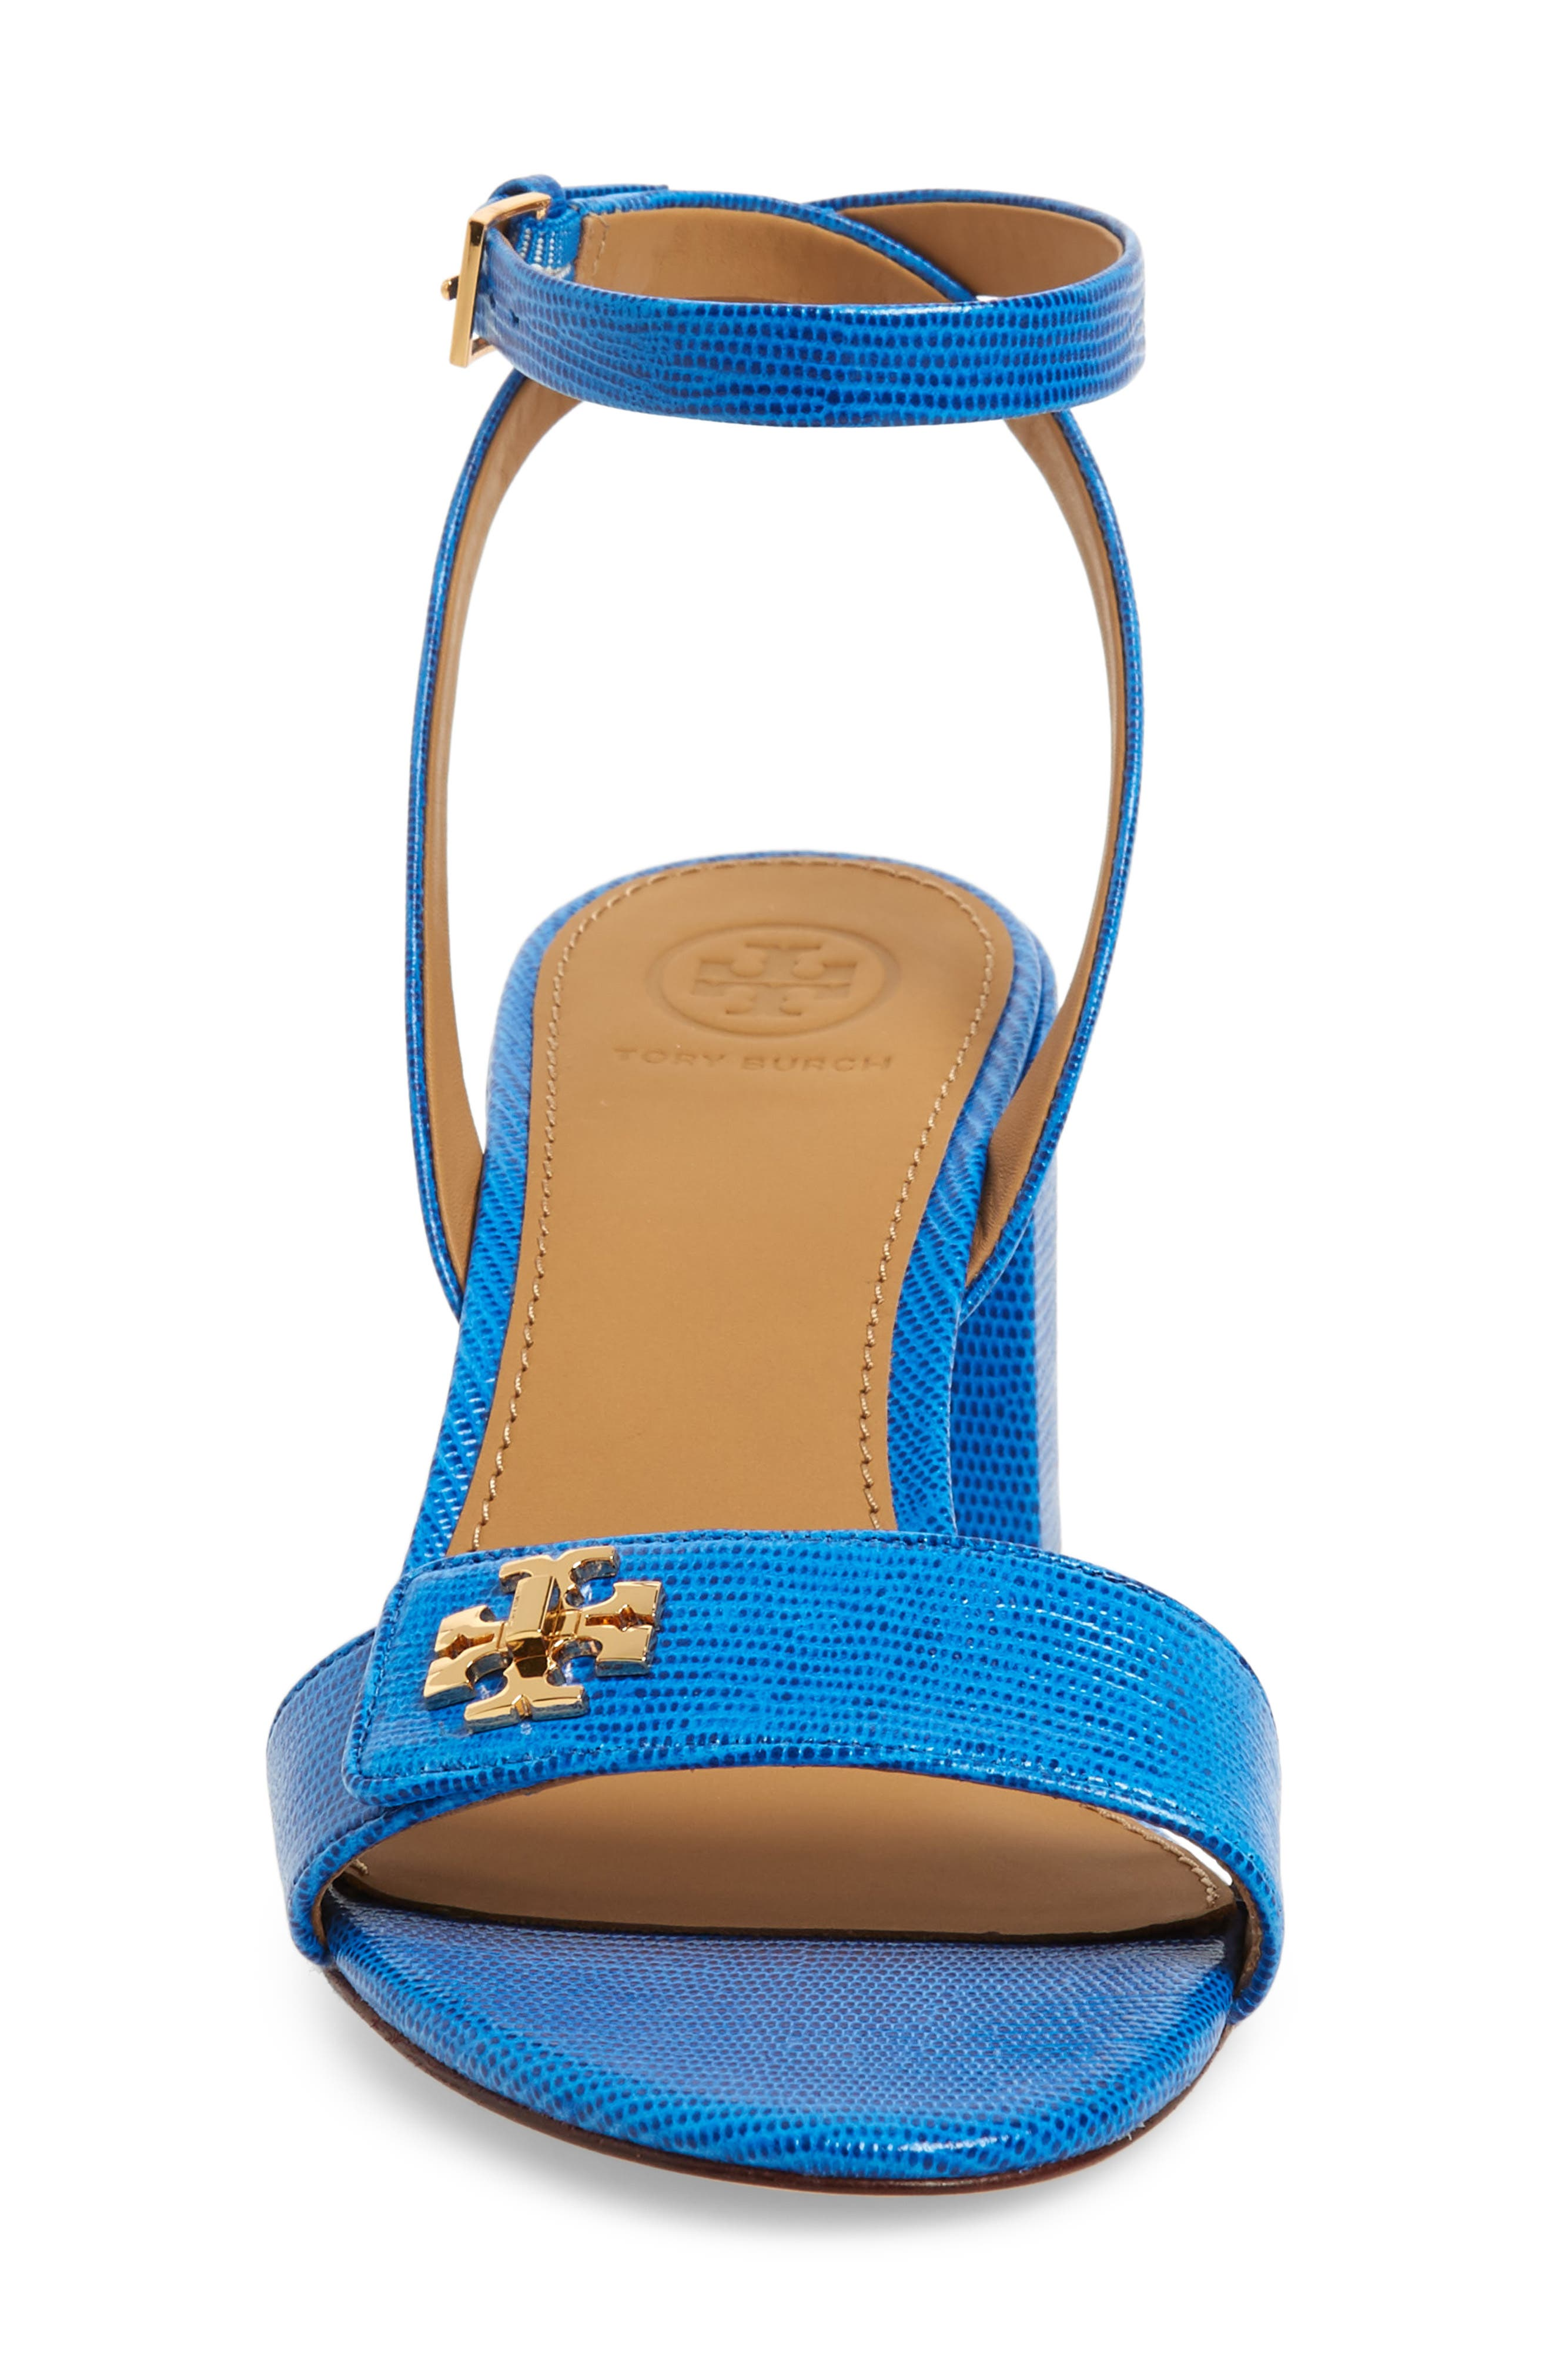 TORY BURCH, Kira Block Heel Sandal, Alternate thumbnail 4, color, BRIGHT TROPICAL BLUE